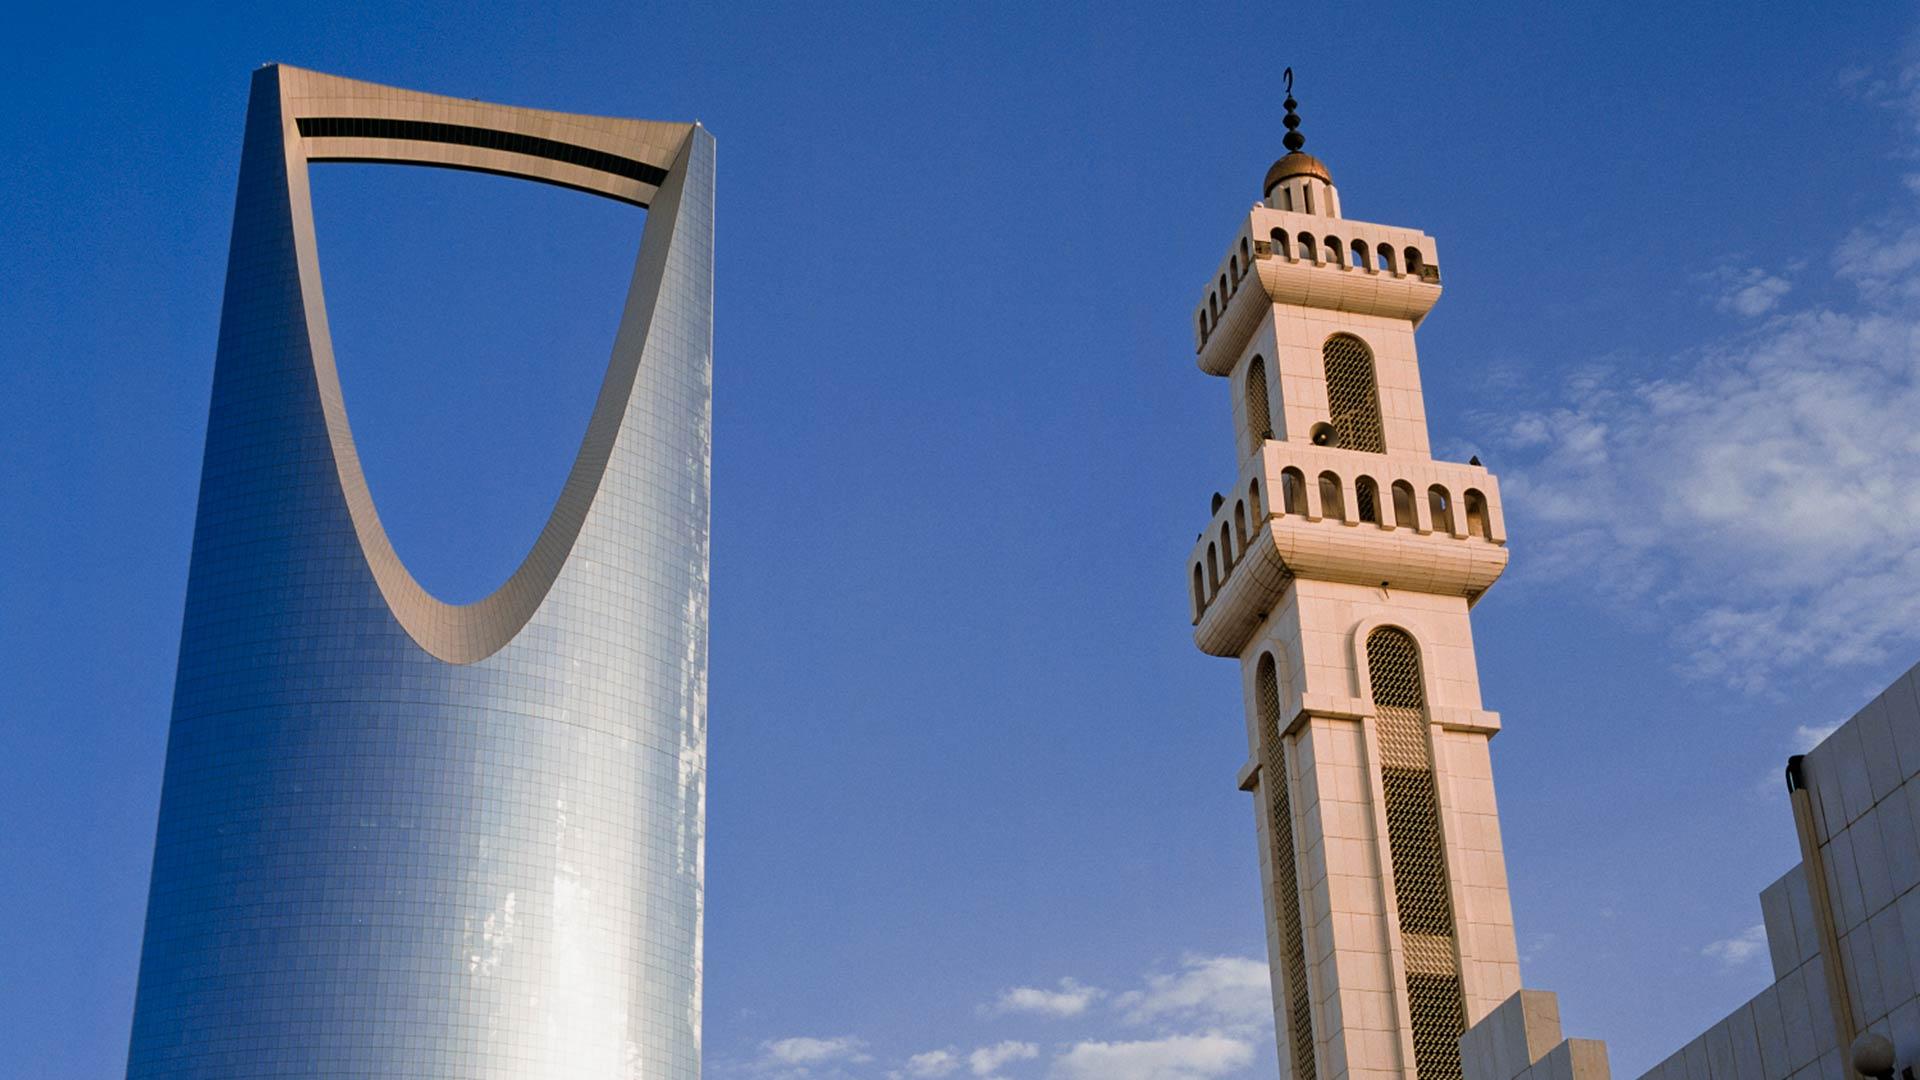 Mosque minaret next to Kingdom Centre Tower in Riyadh, Saudi Arabia